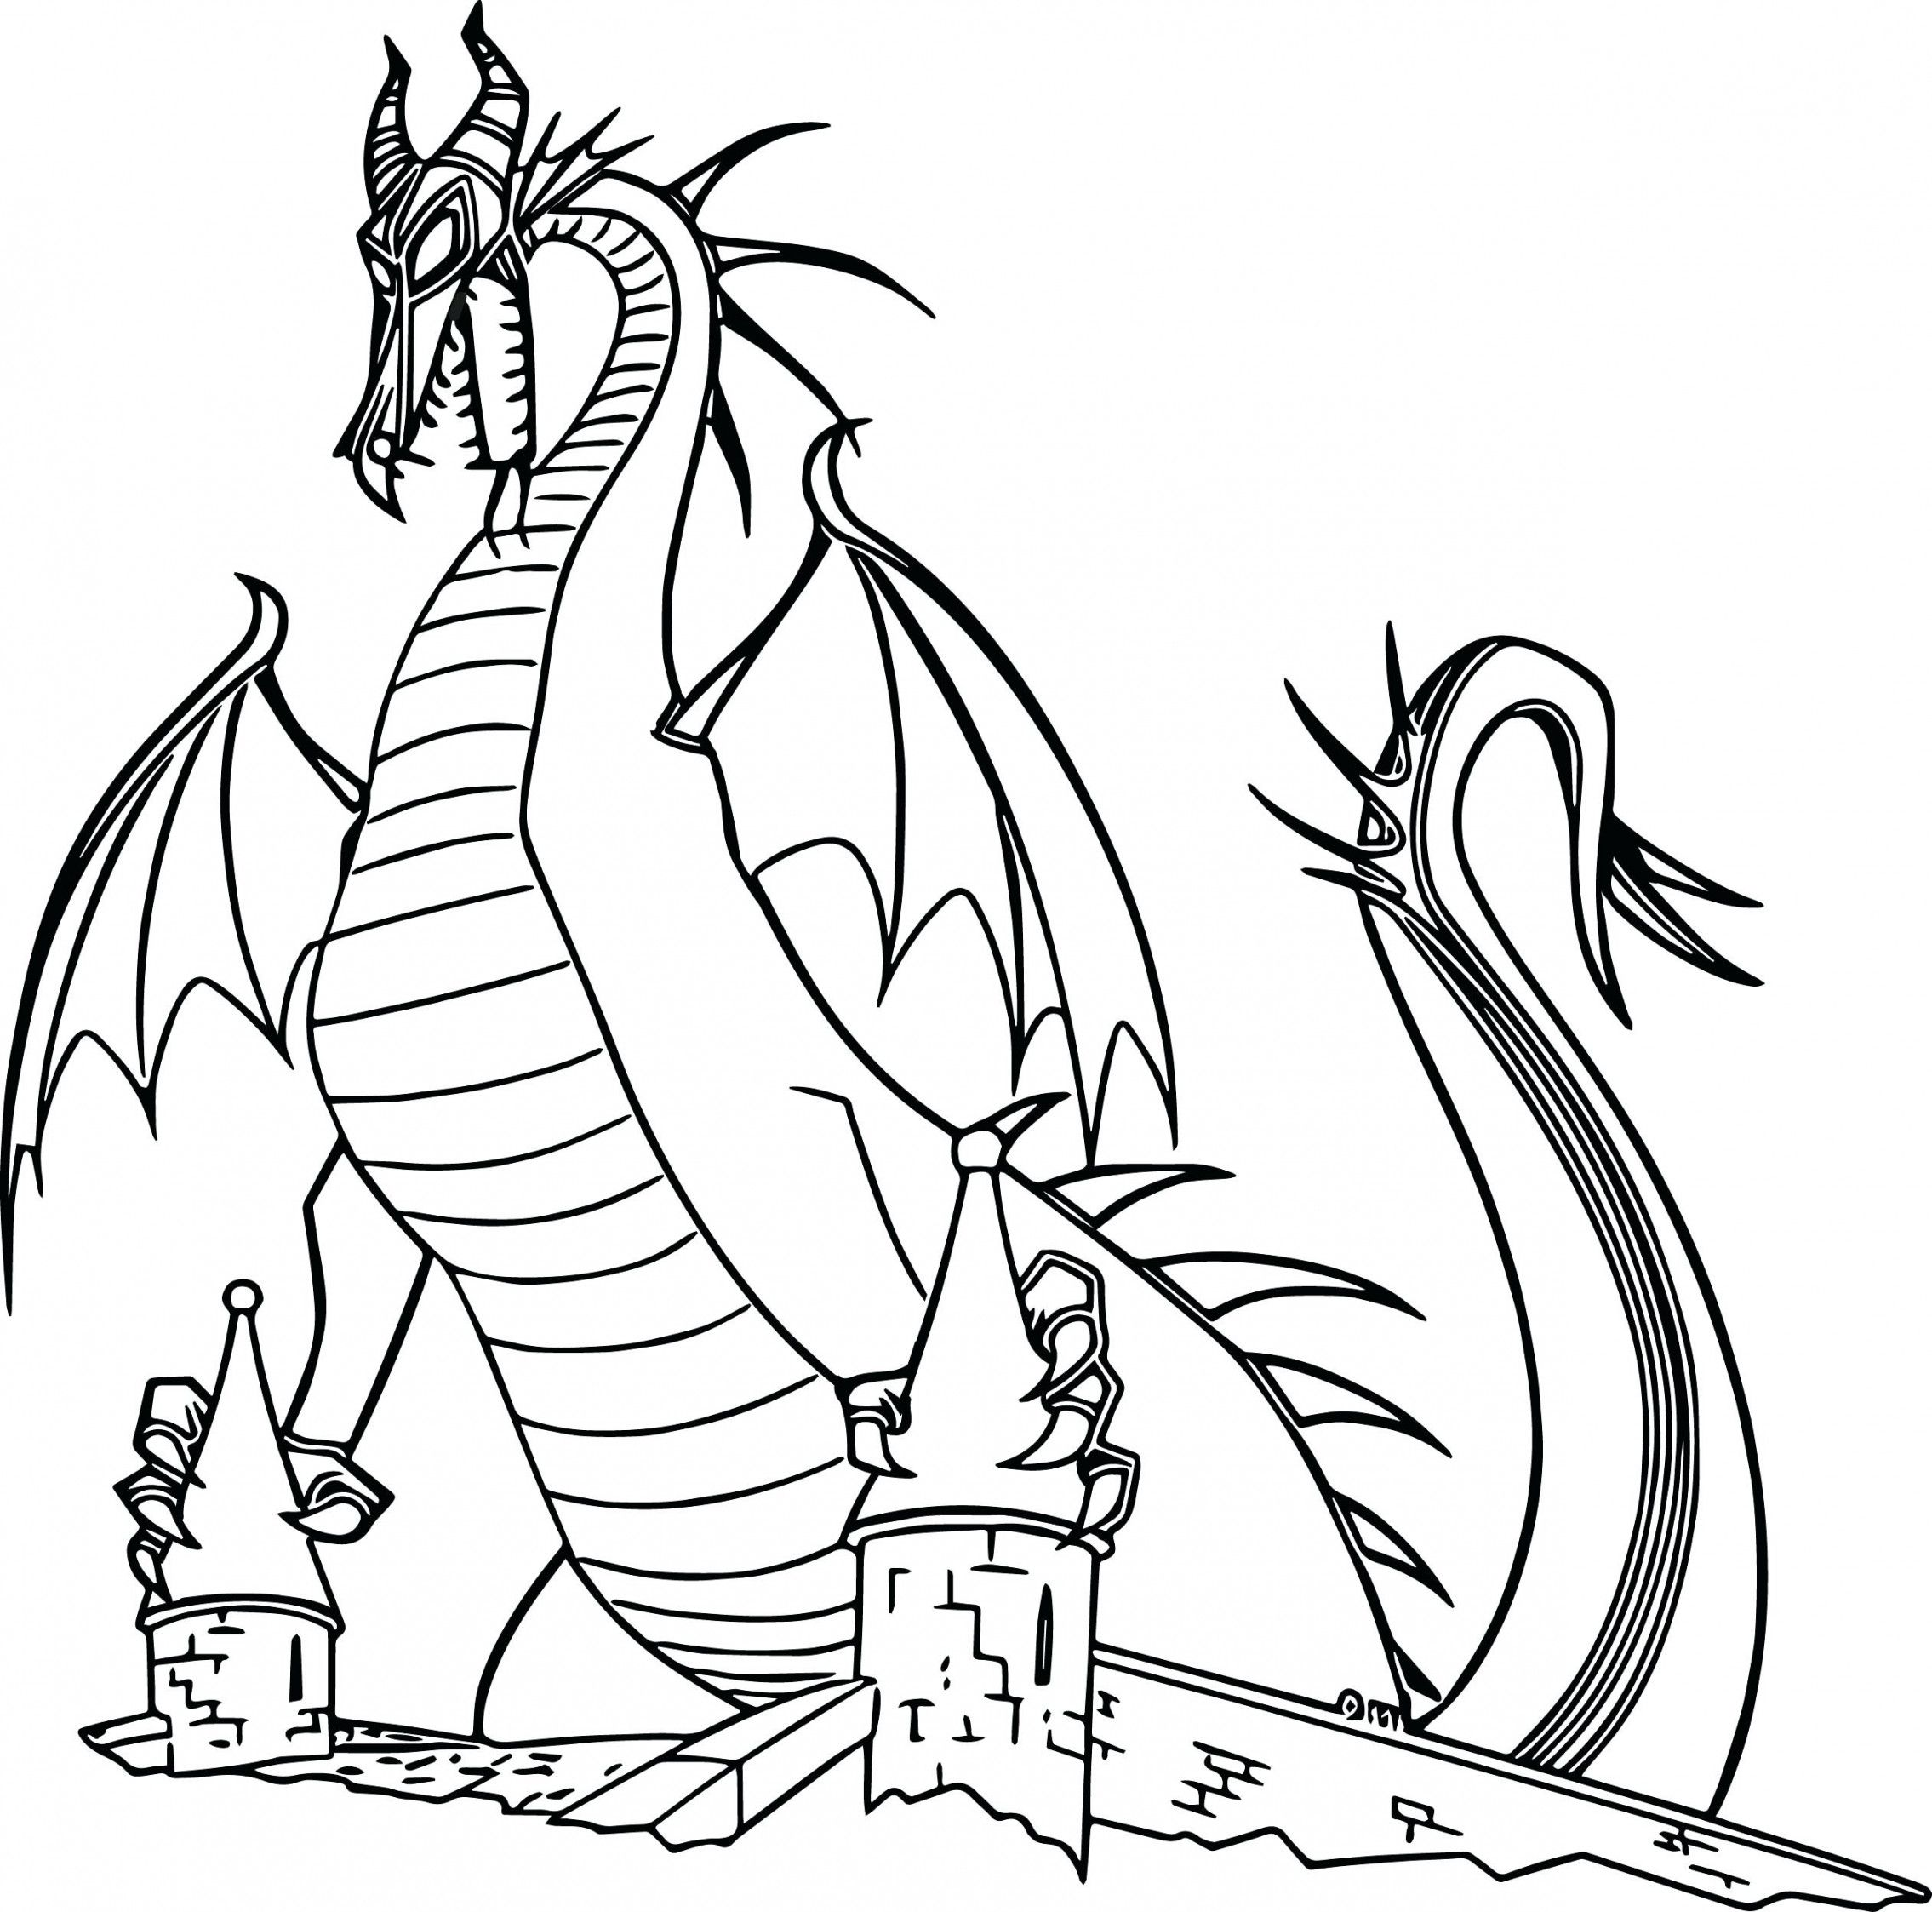 24 Vast Dinosaur King Coloring Page Dragon Coloring Page Animal